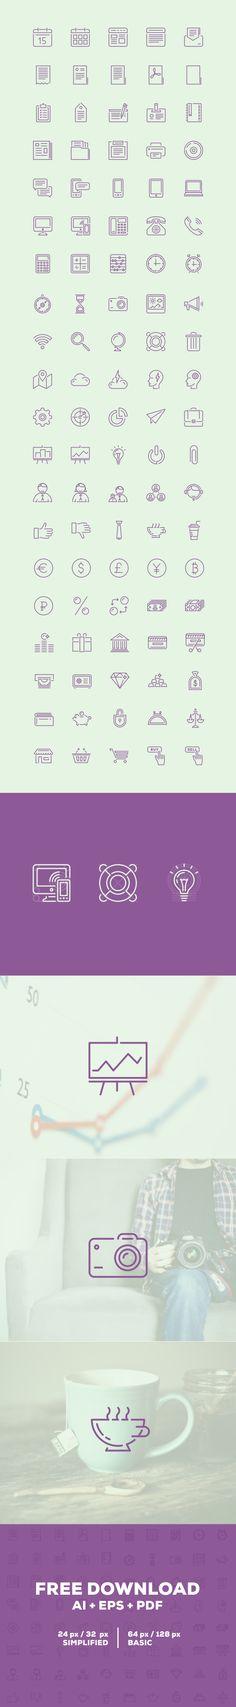 Free Icons | Puppets Icons | Ai + Eps + Pdf (5.3 MB) | puppetscientists.com